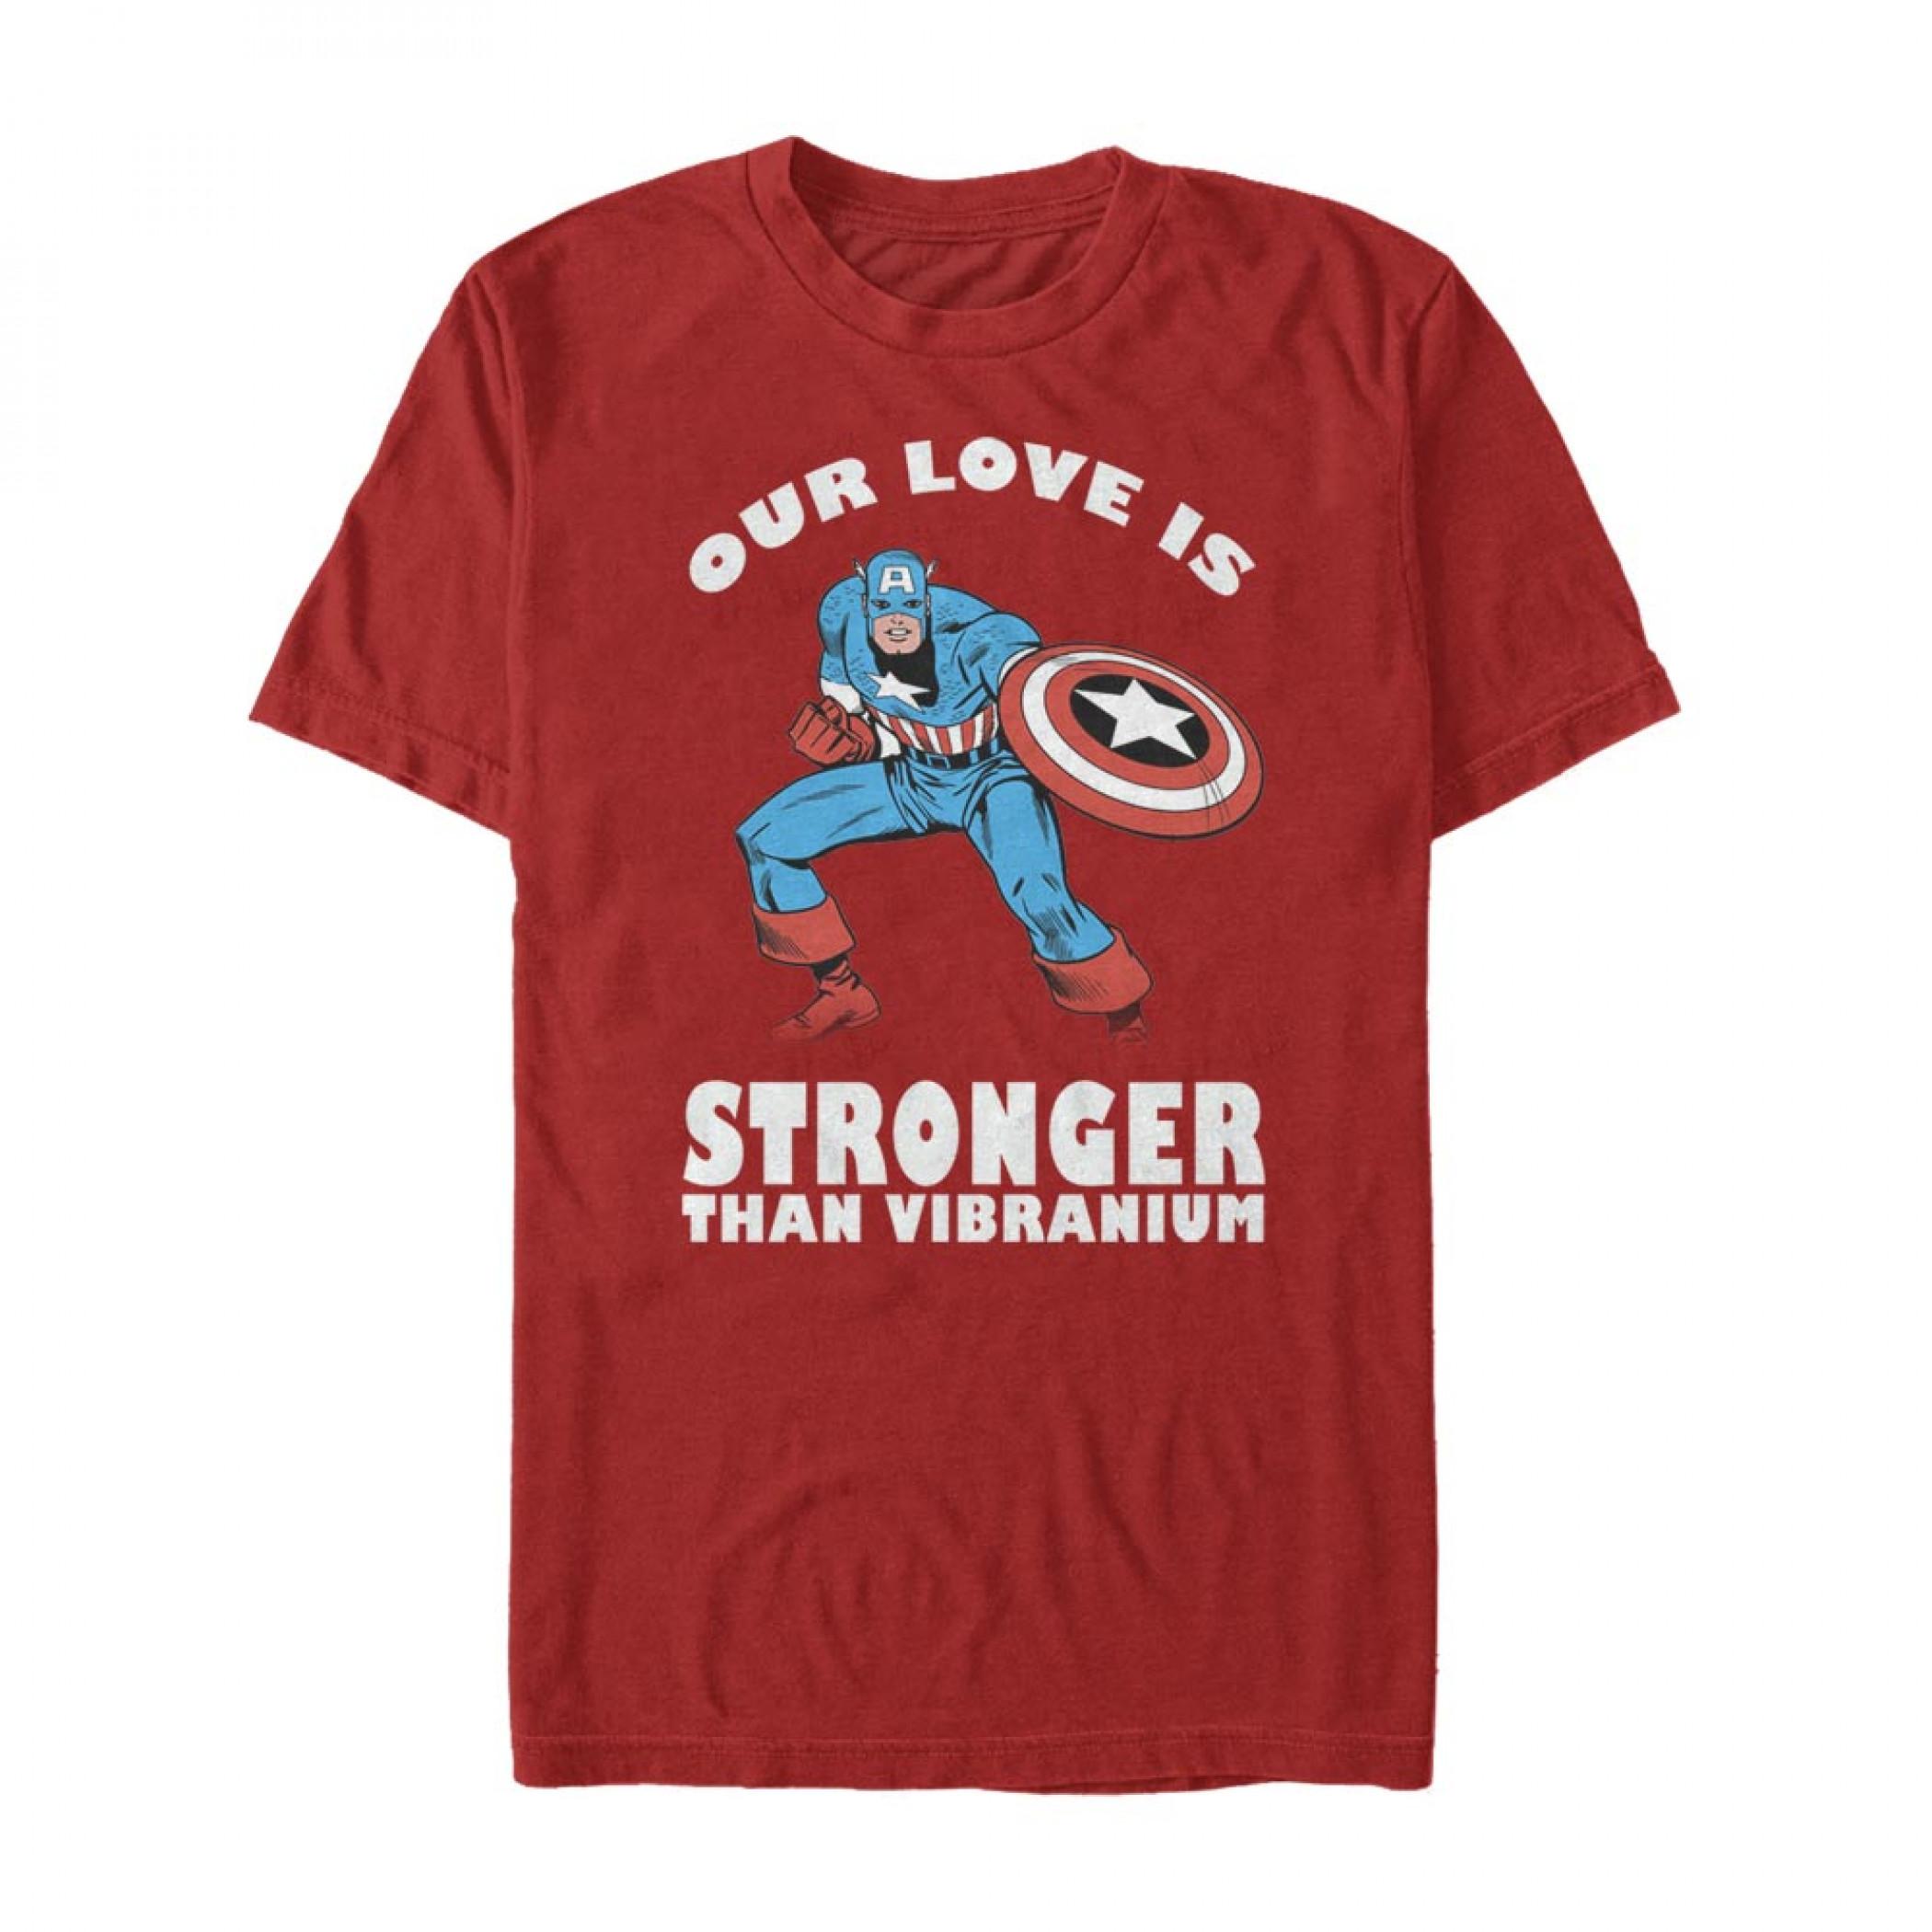 Captain America Our Love is Stronger Than Vibranium T-Shirt